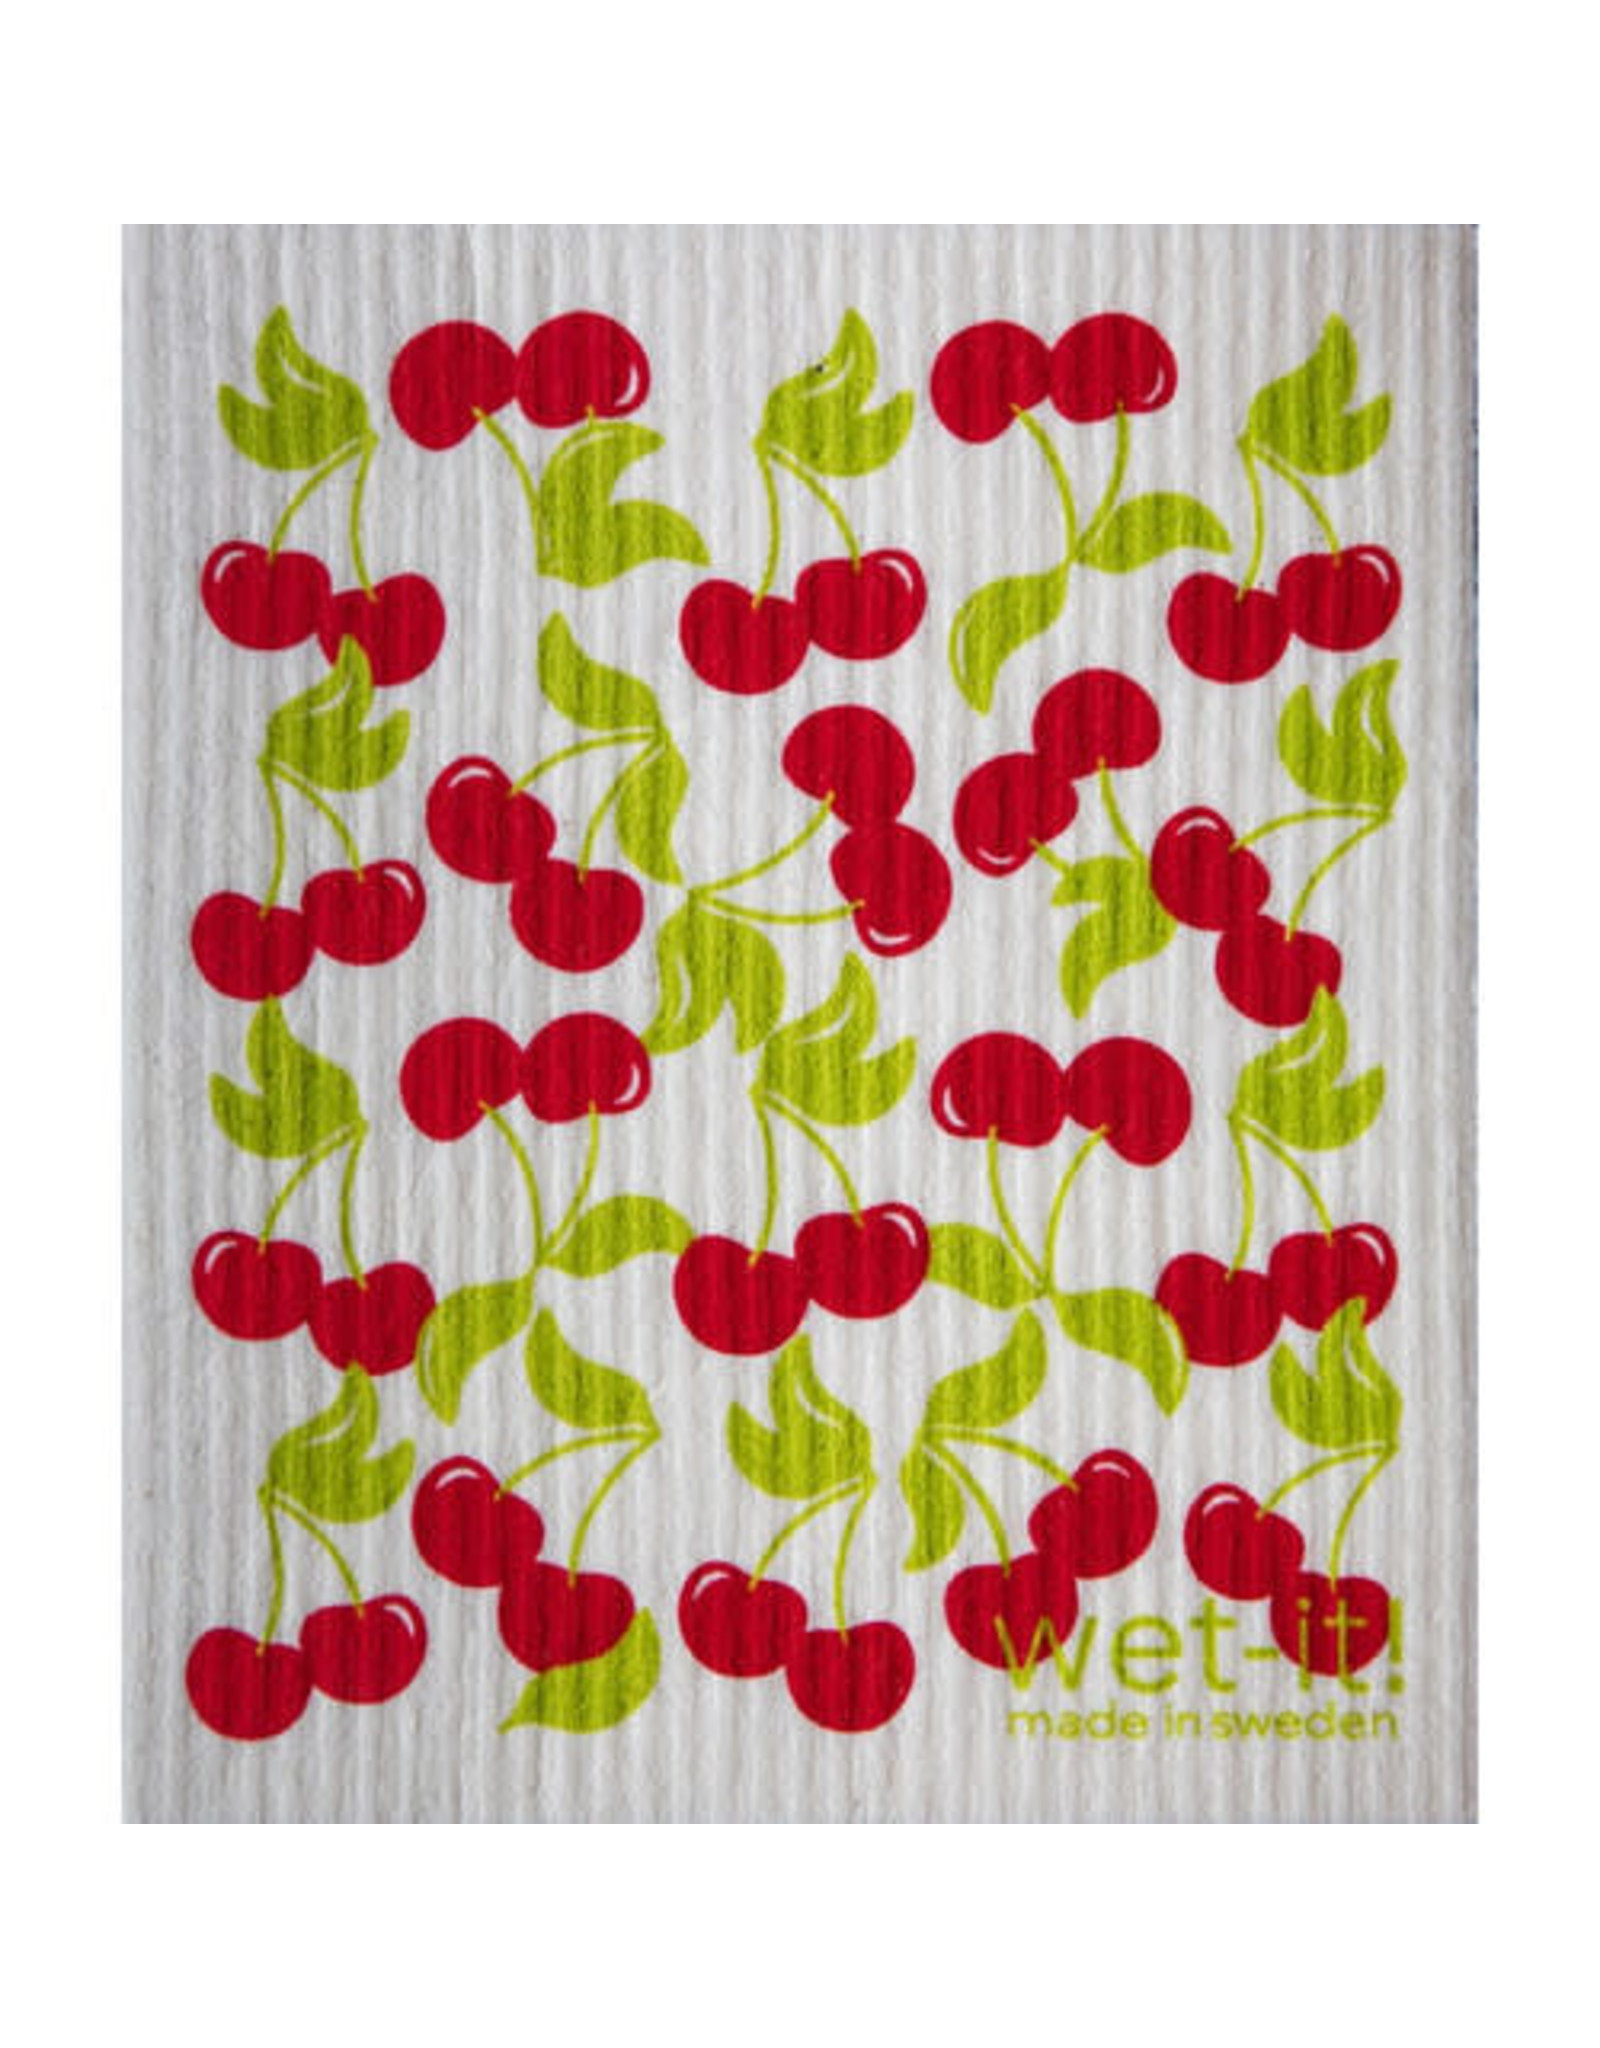 wet-it! Sweet Cherry Swedish dish cloth